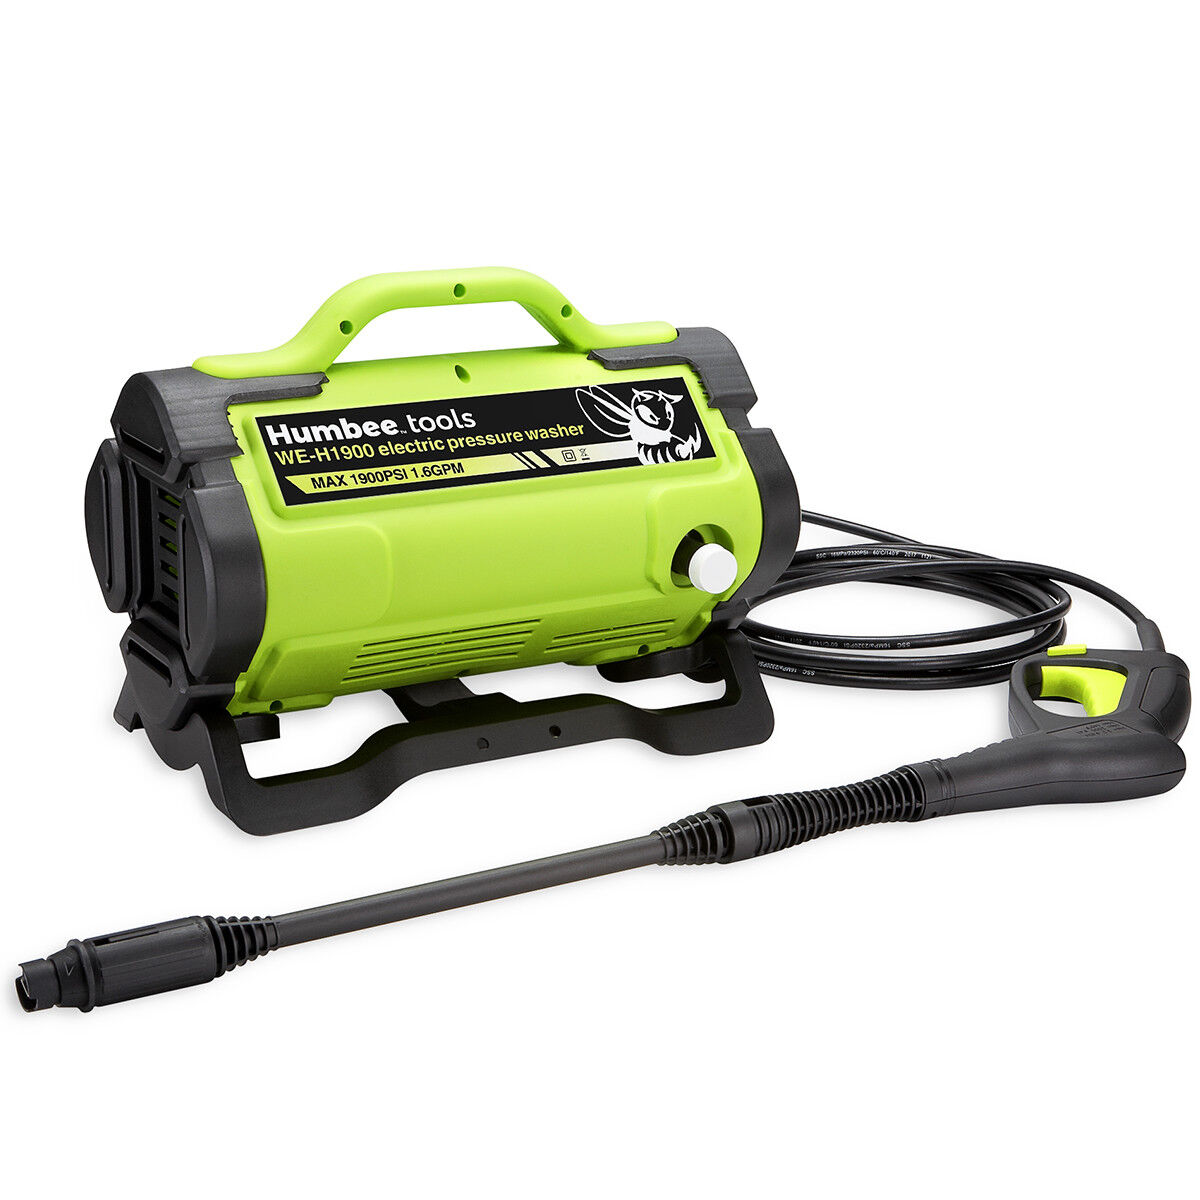 1 900 psi handheld electric pressure washer